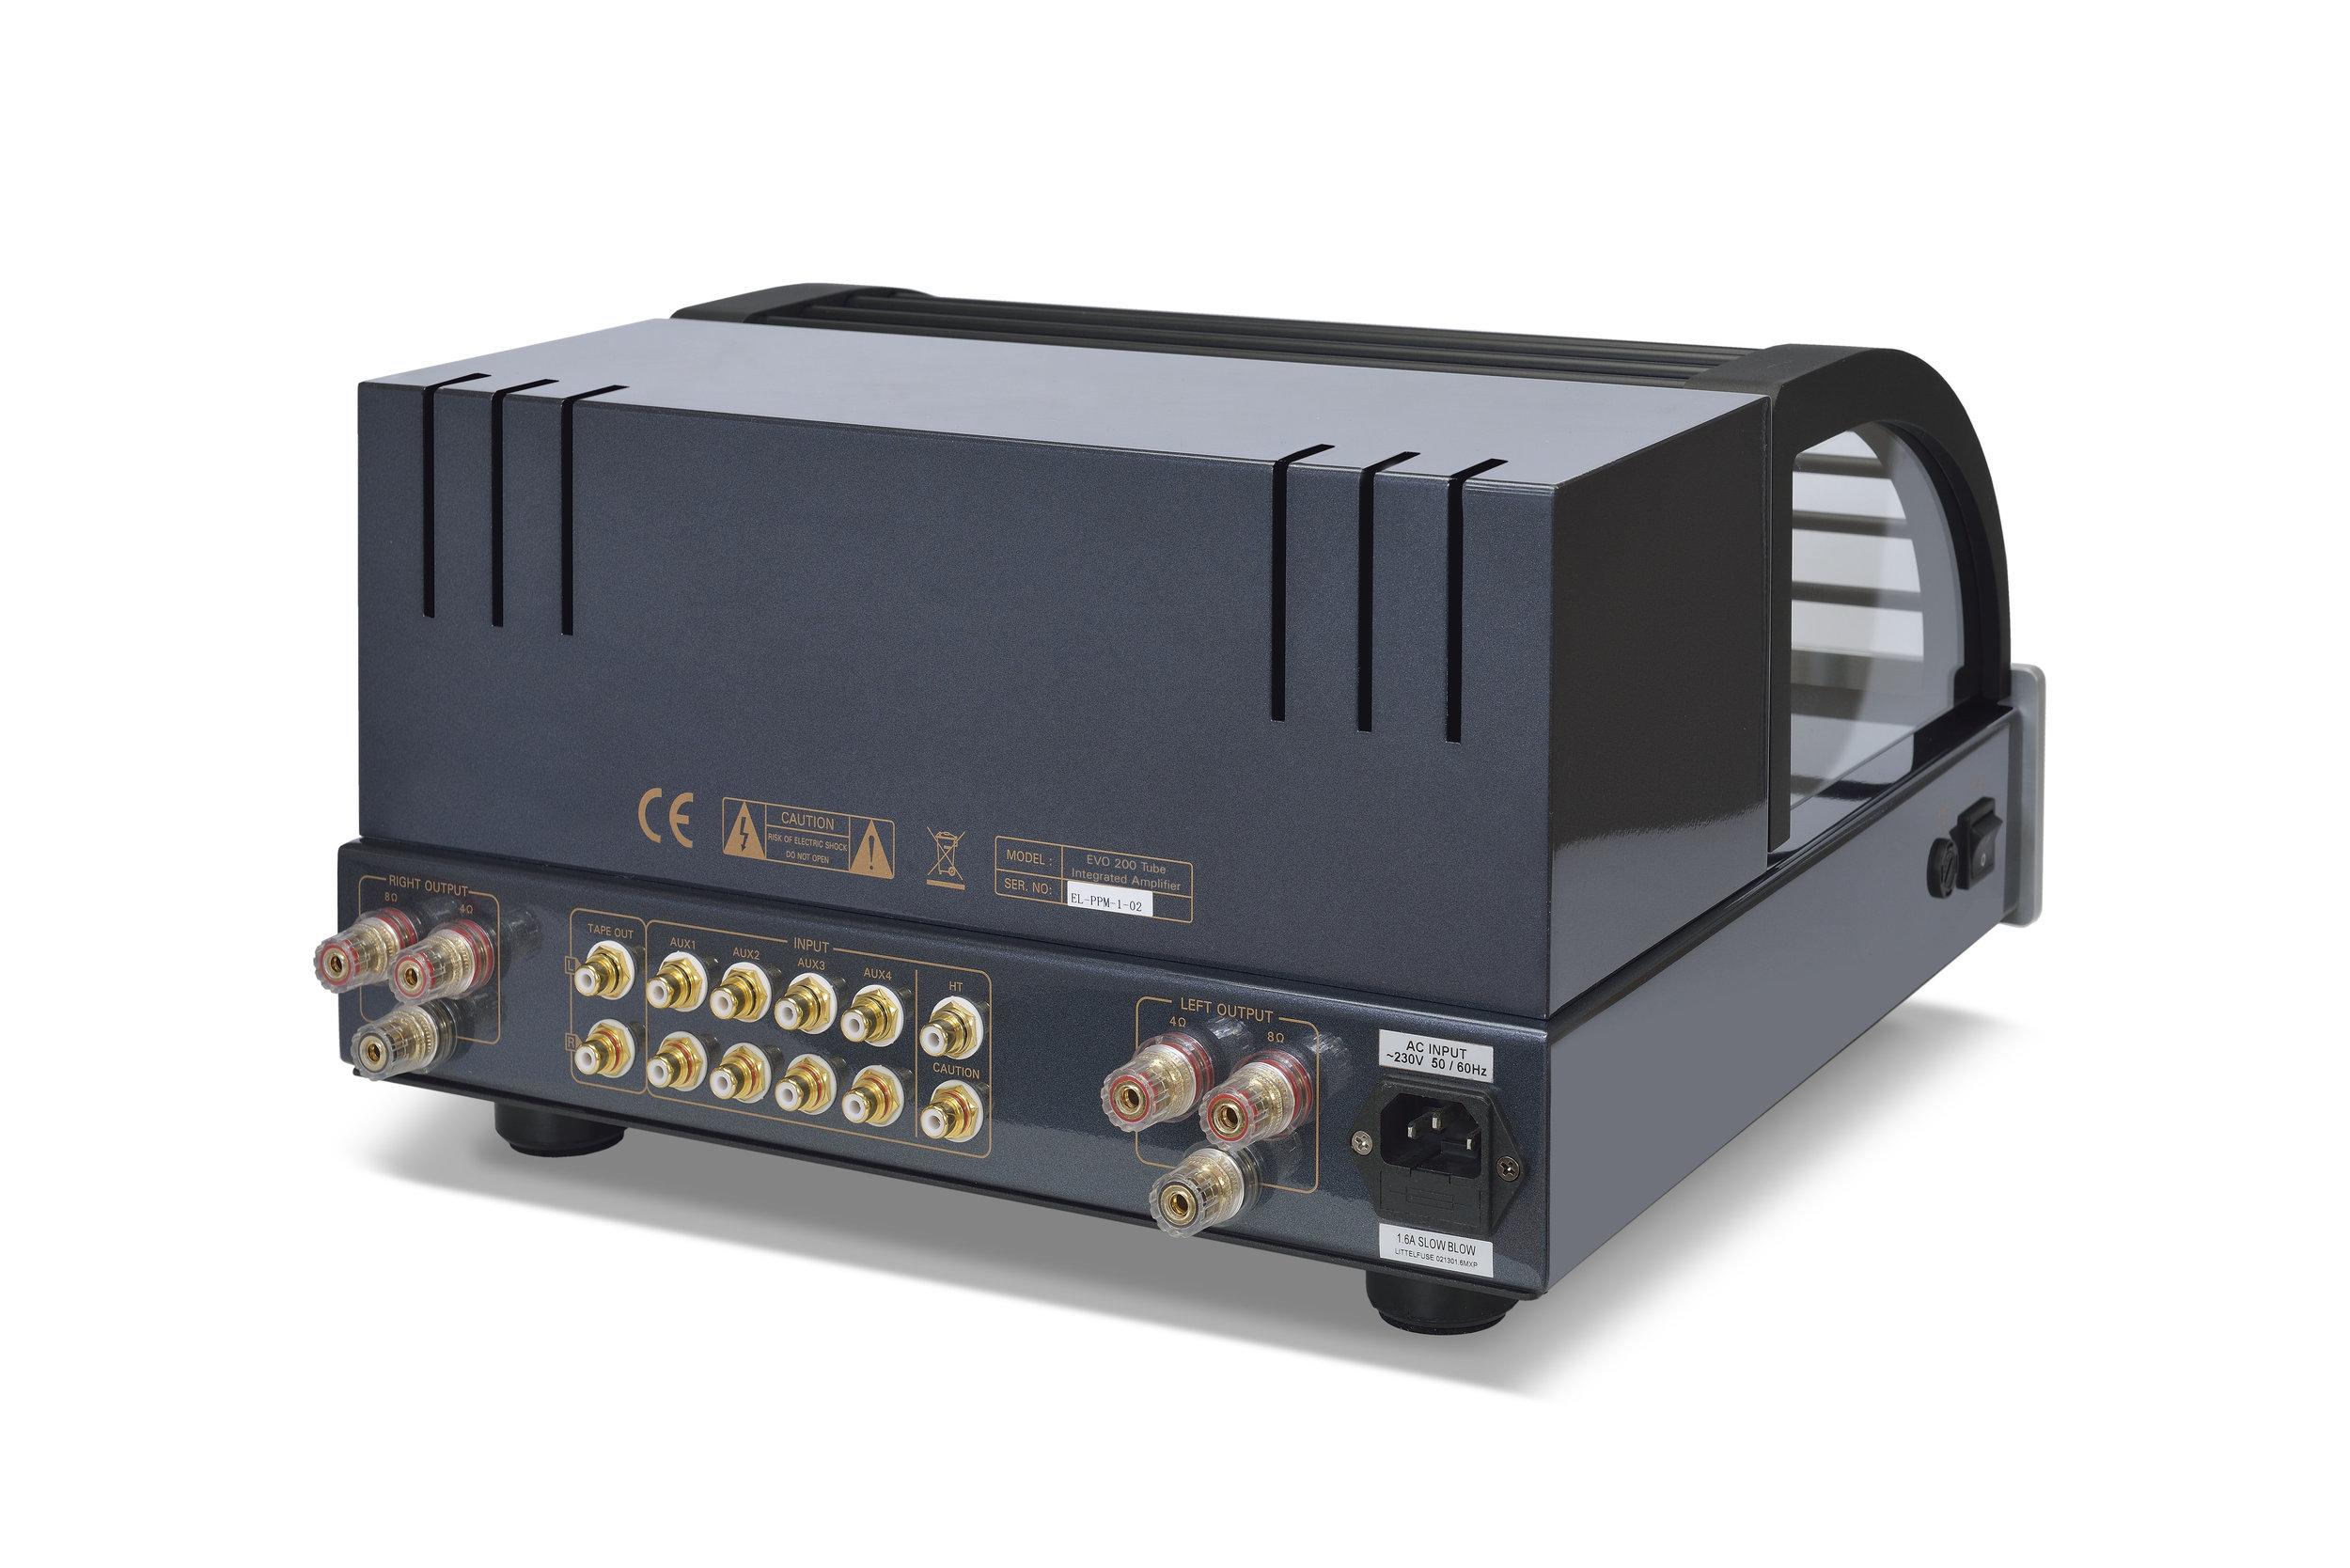 107b - PrimaLuna Evo 200 Tube Integrated Amplifier - silver - back - slanted - white background.jpg